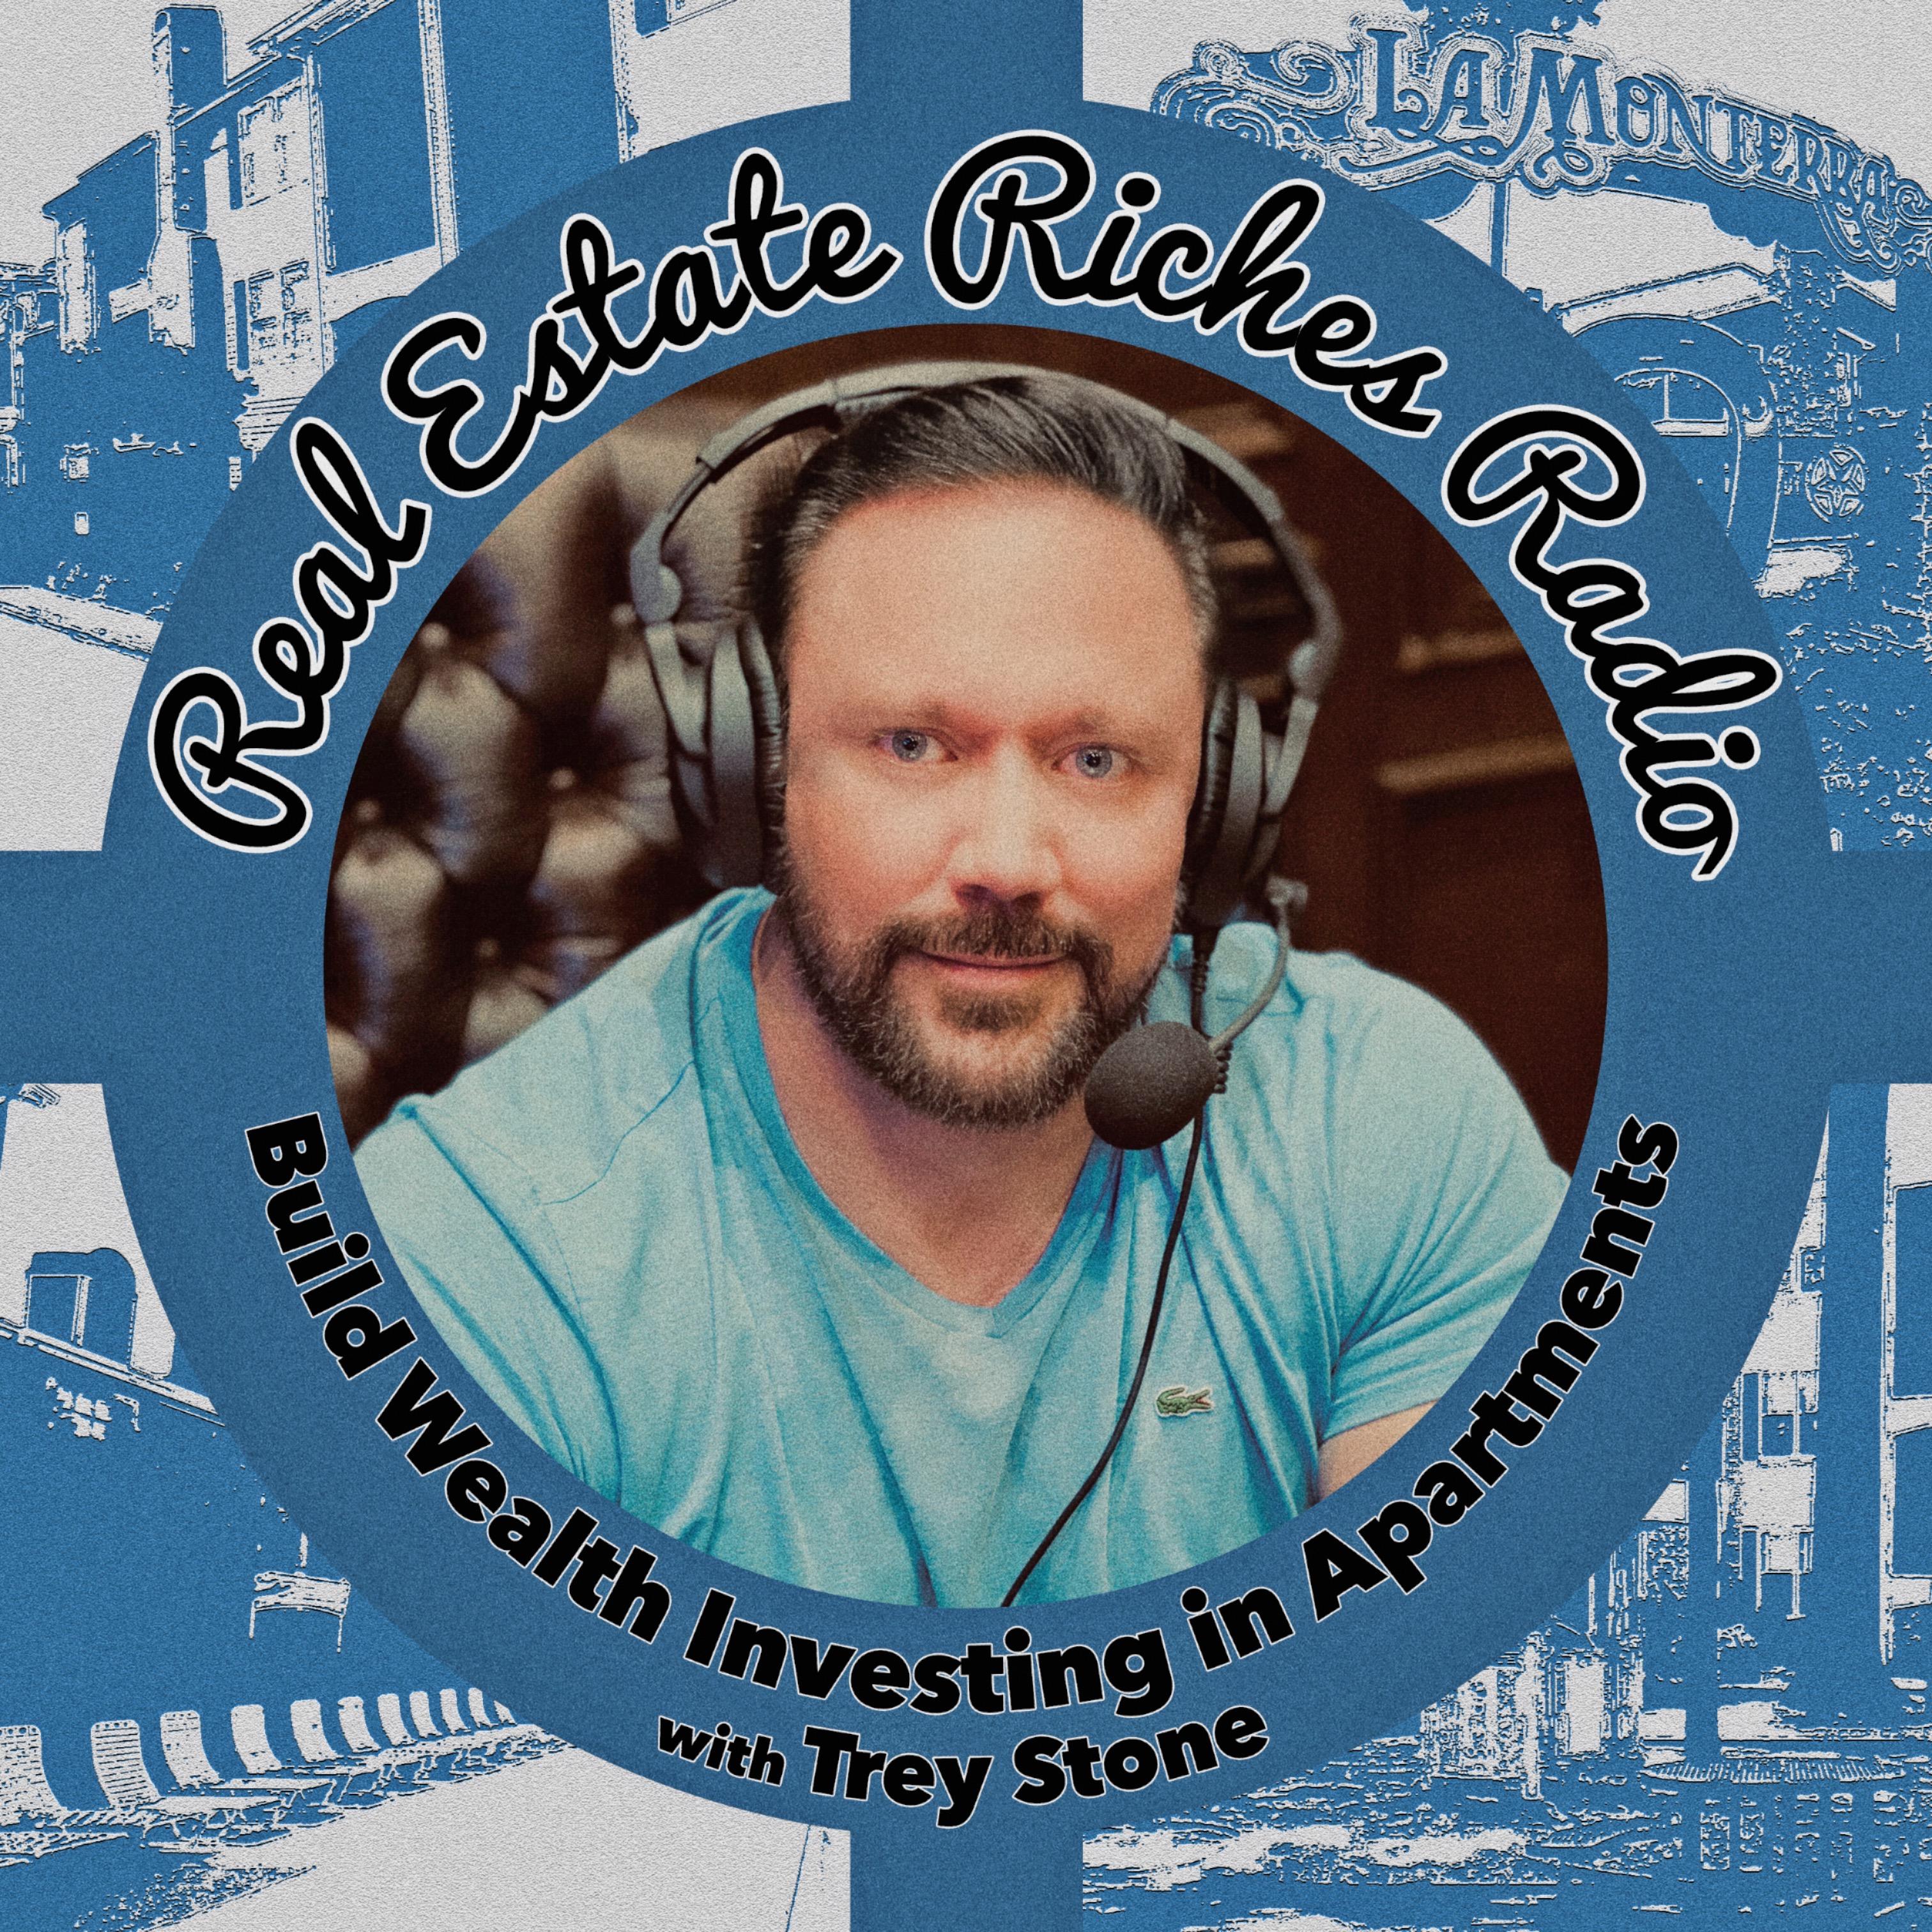 Real Estate Riches Radio show art